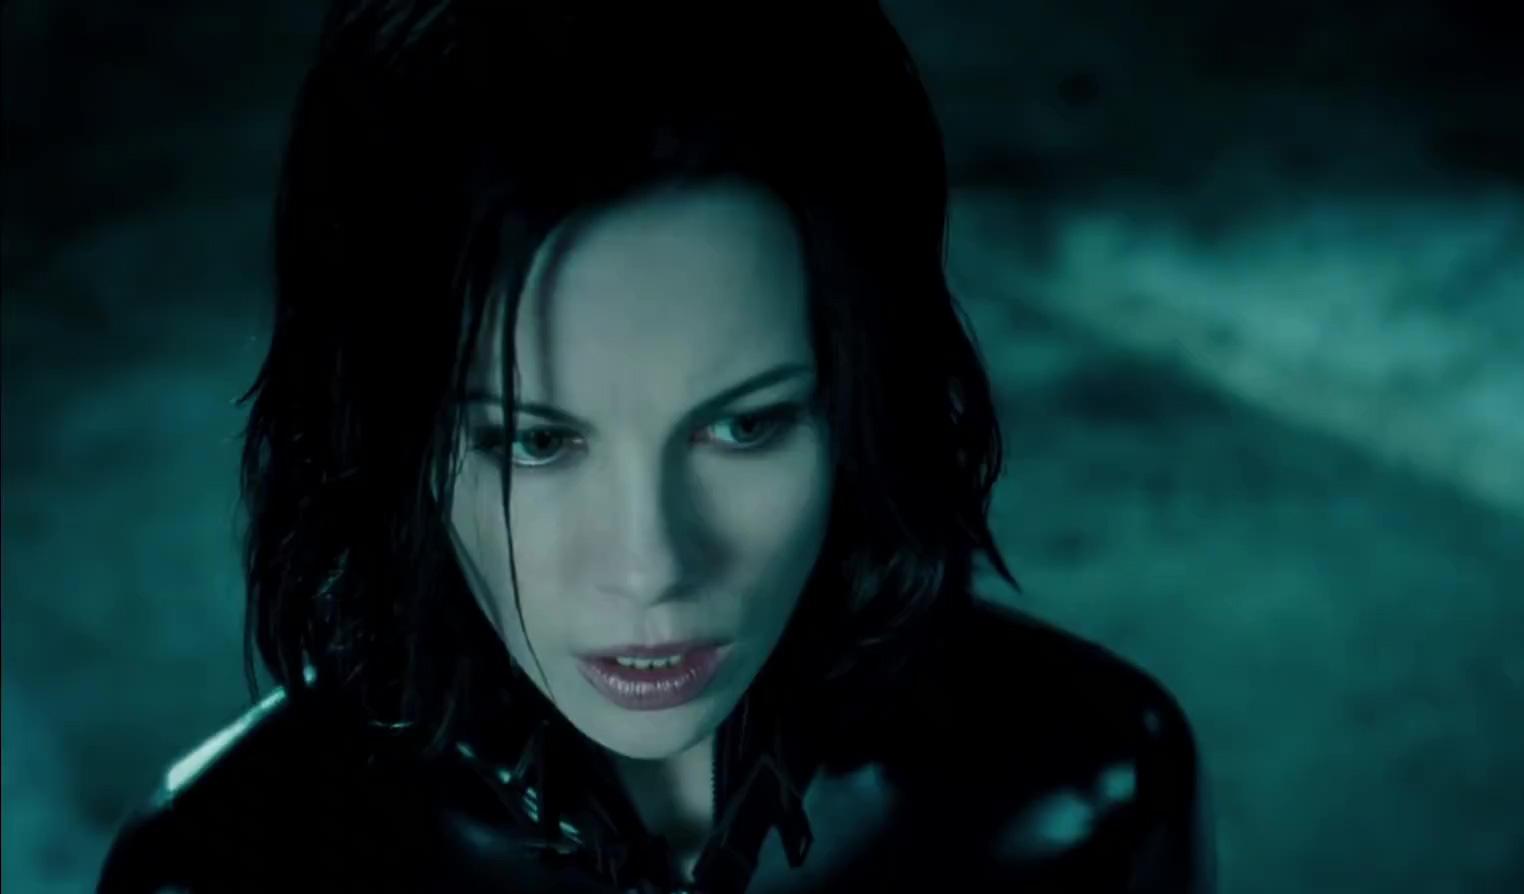 Underworld: Evolution CLIPS – You Don't Scare Me